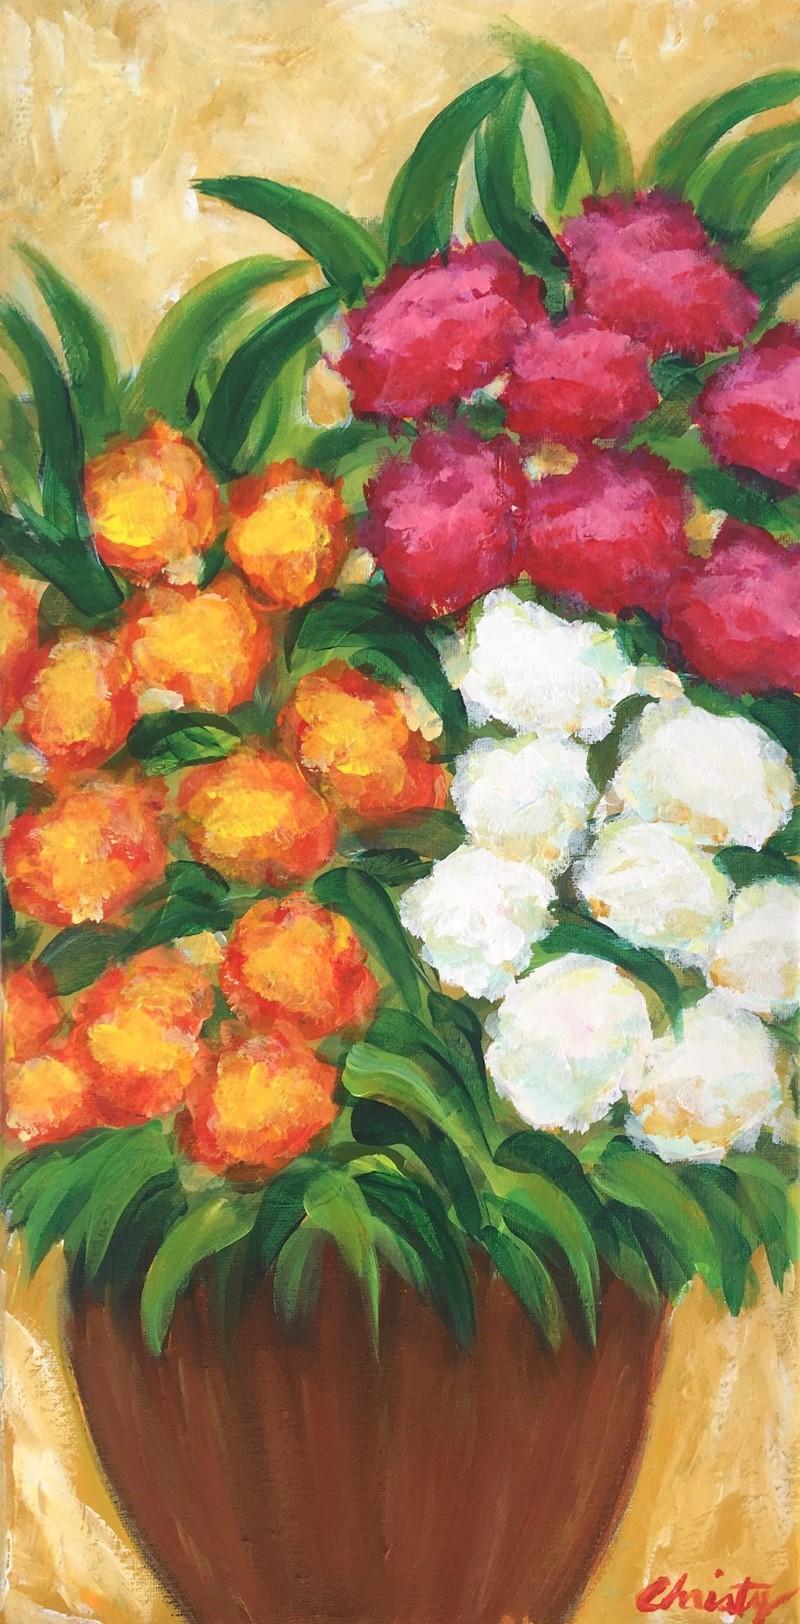 IN-STUDIO: Fall Mums - 10x20 Acrylic on Canvas